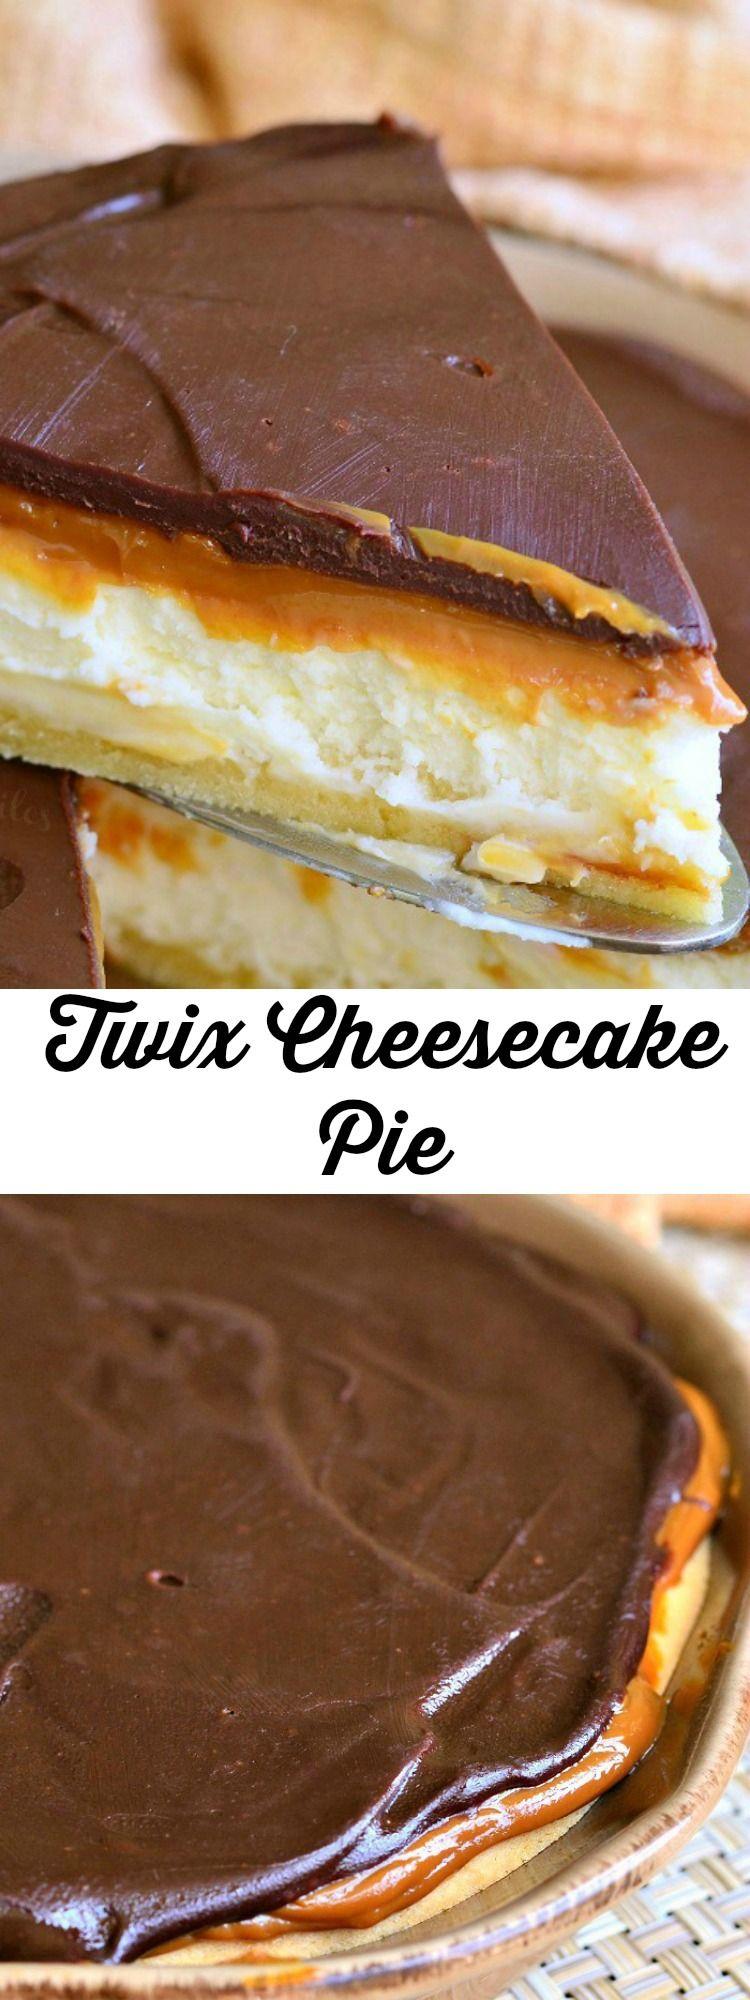 Twix Cheesecake Pie! Heavenly cheesecake pie made to taste ...